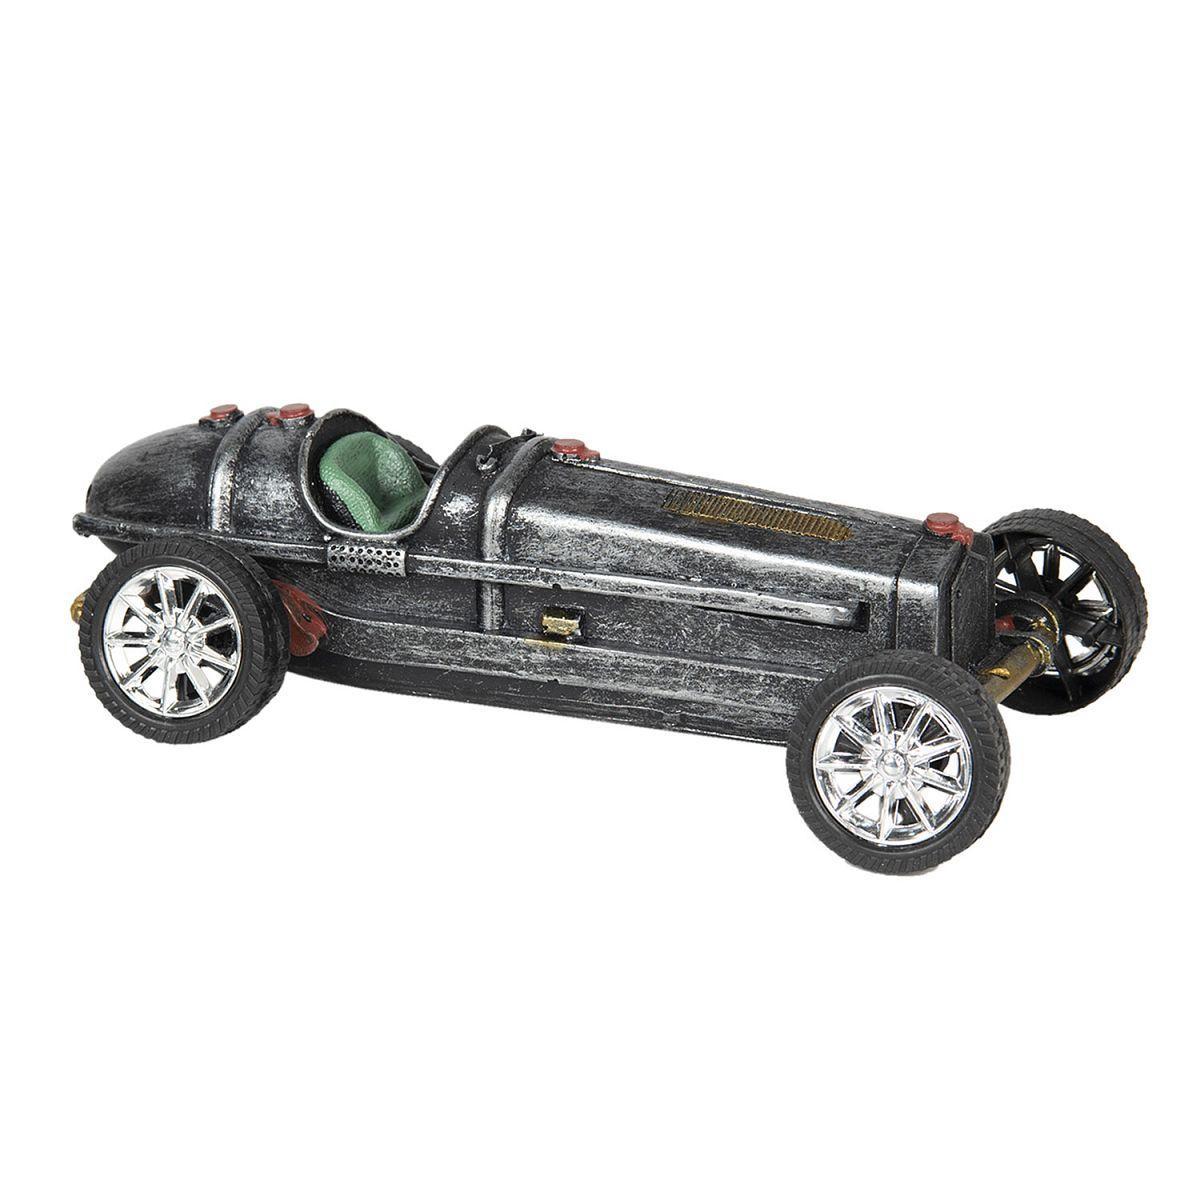 1- Dekorativní auto